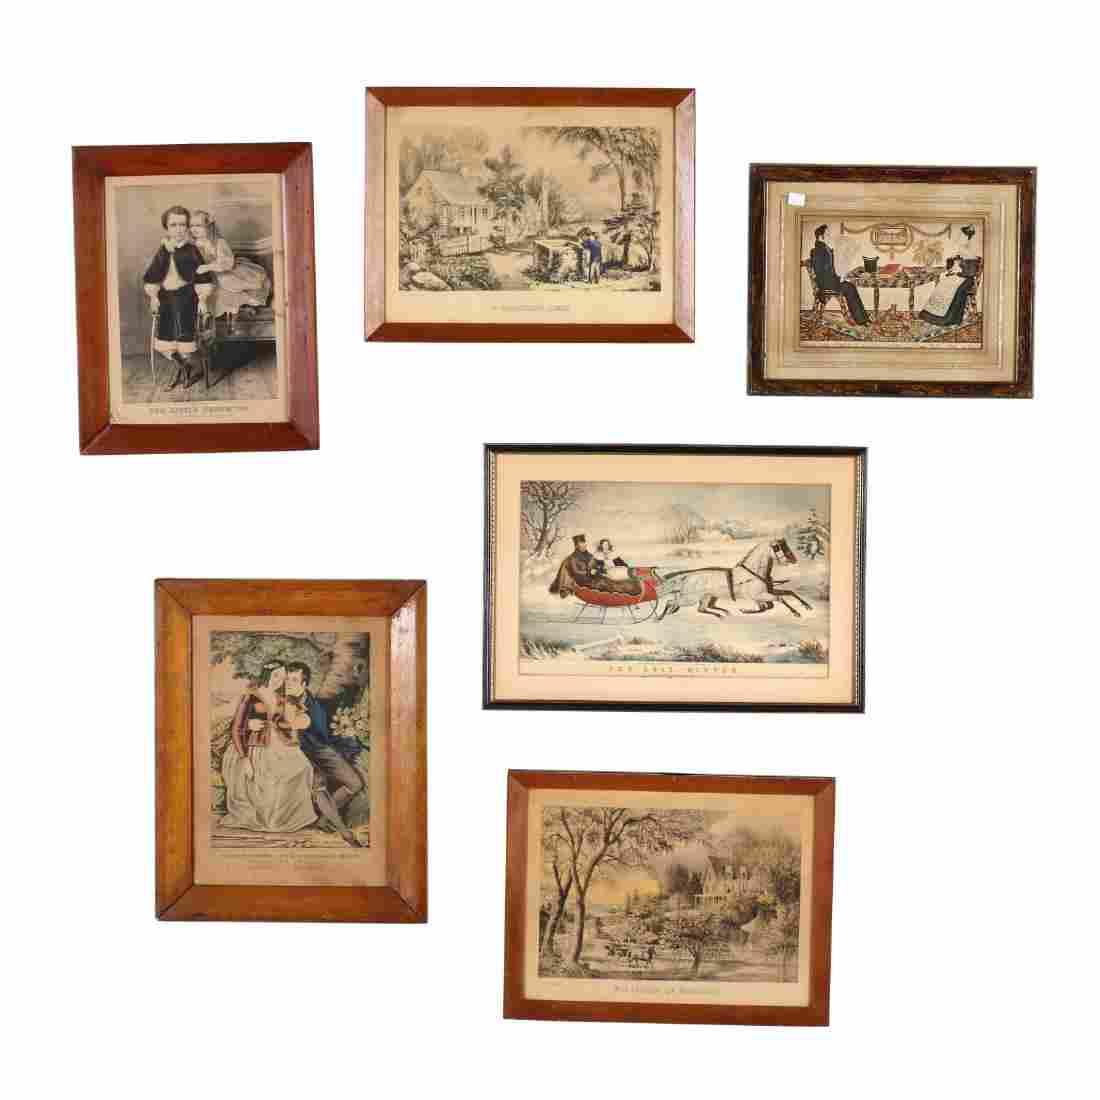 Six Vintage Prints, Primarily Currier & Ives